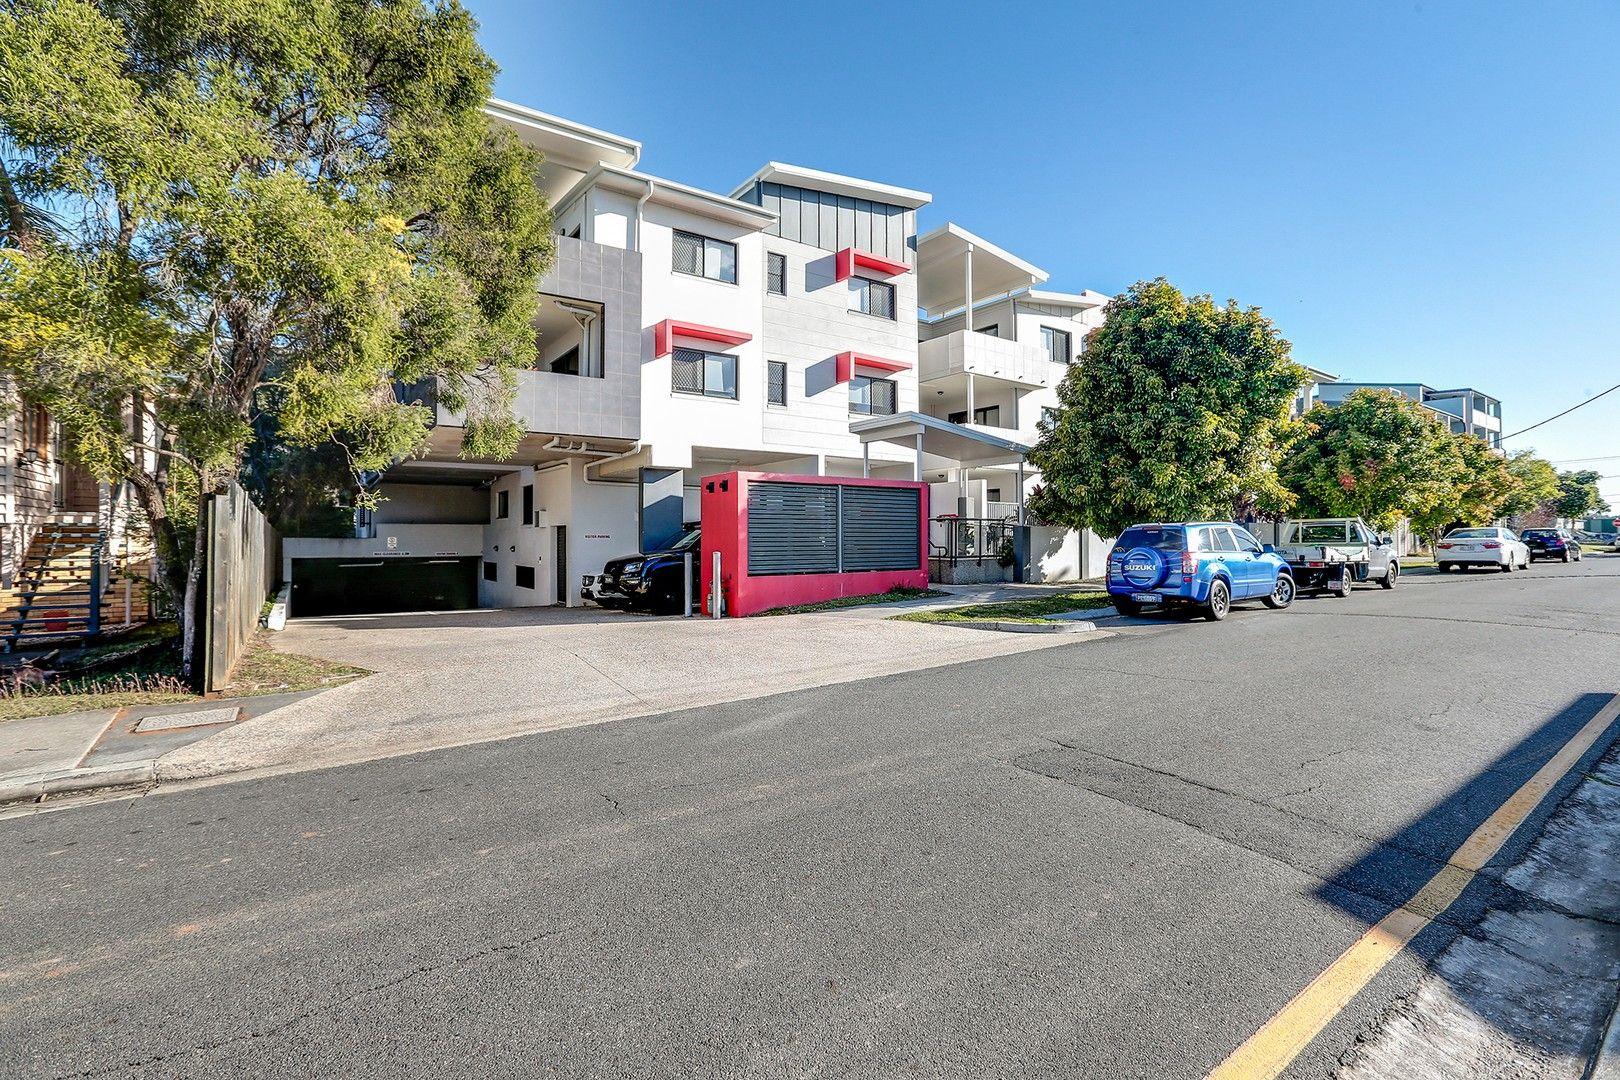 21/11 Lindwall Street, Upper Mount Gravatt QLD 4122, Image 0